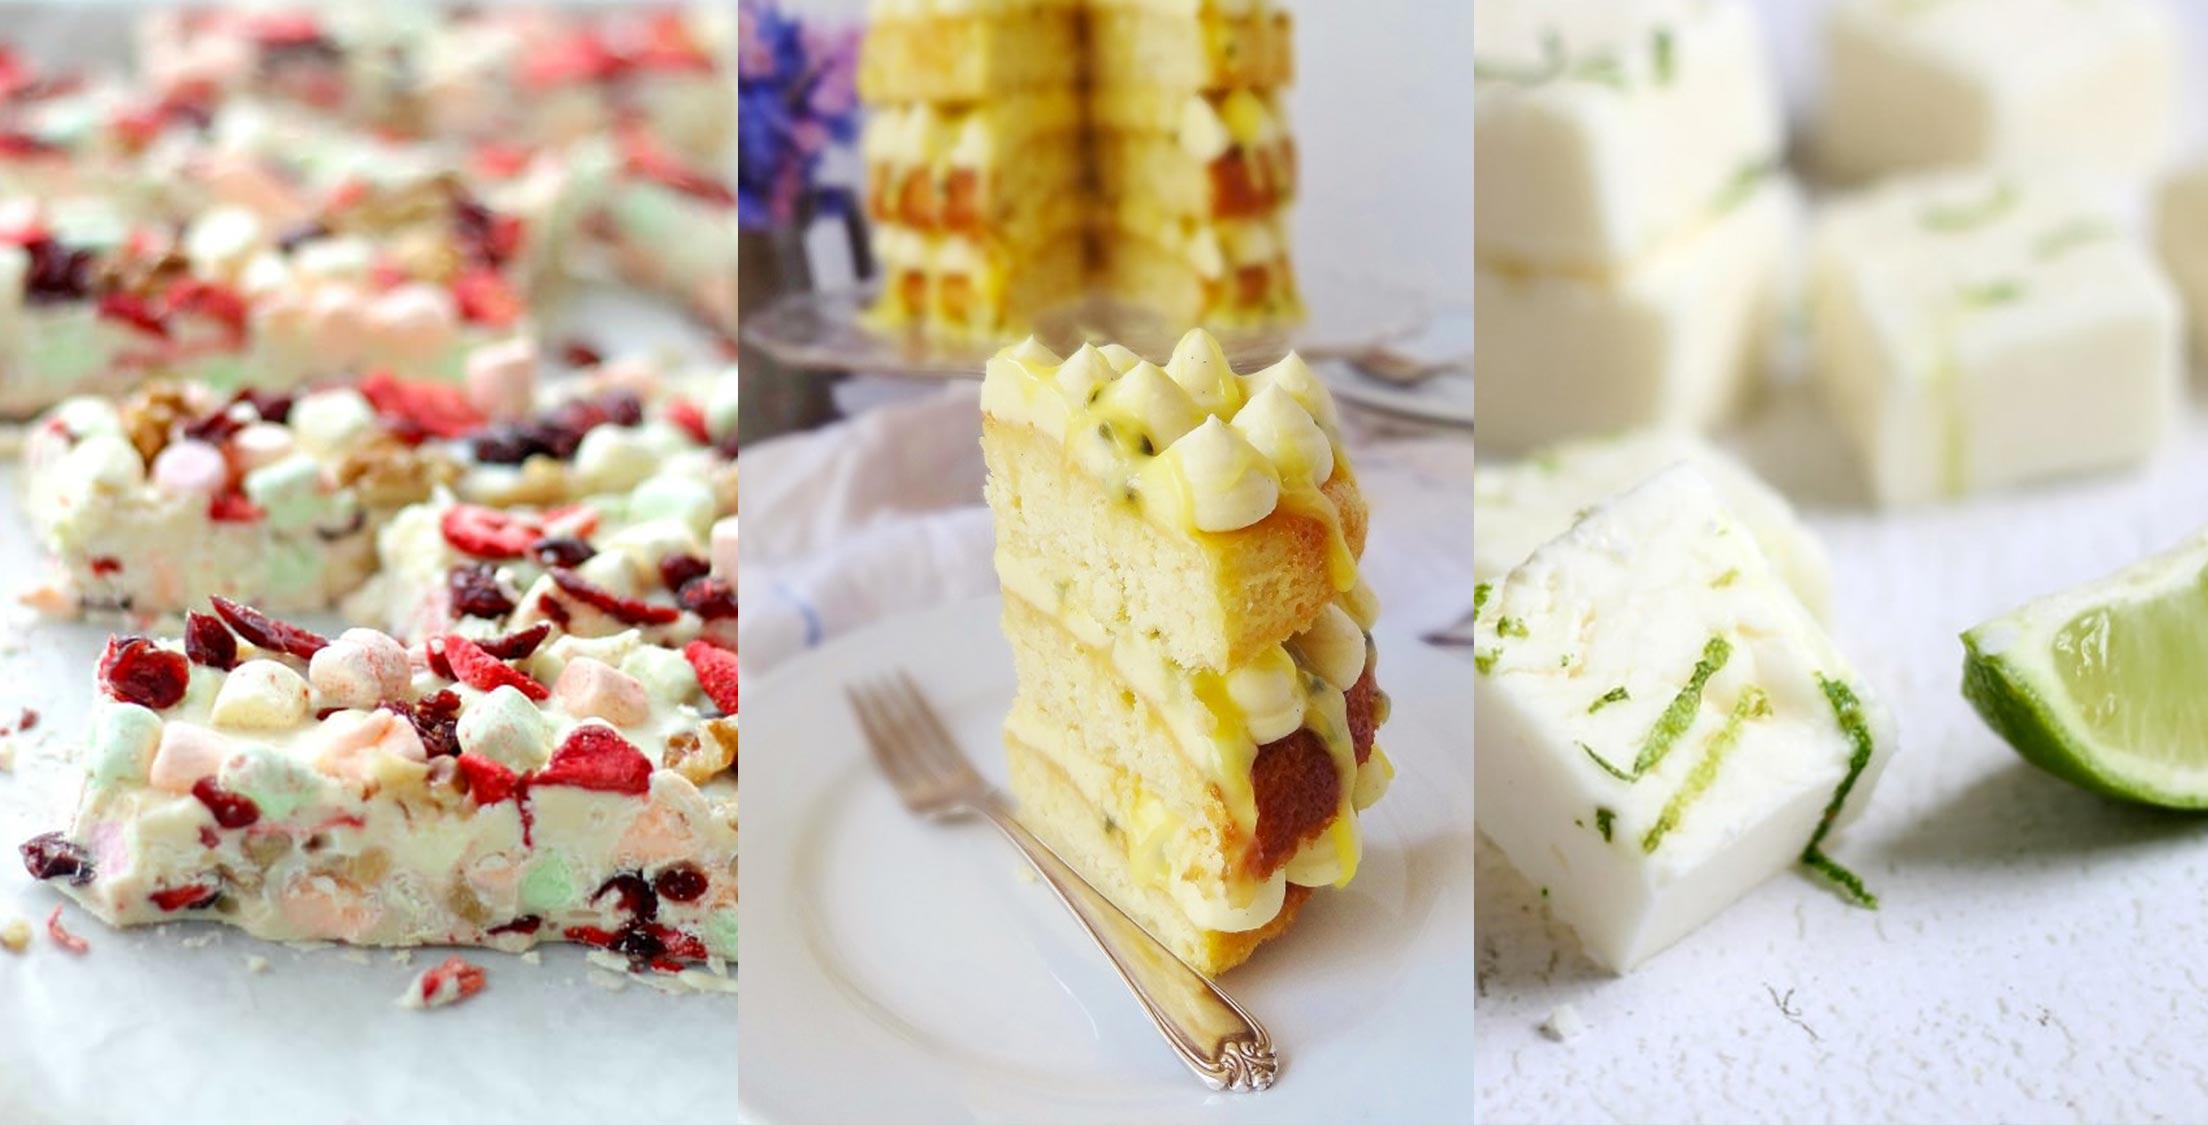 6 wonderful white chocolate treats